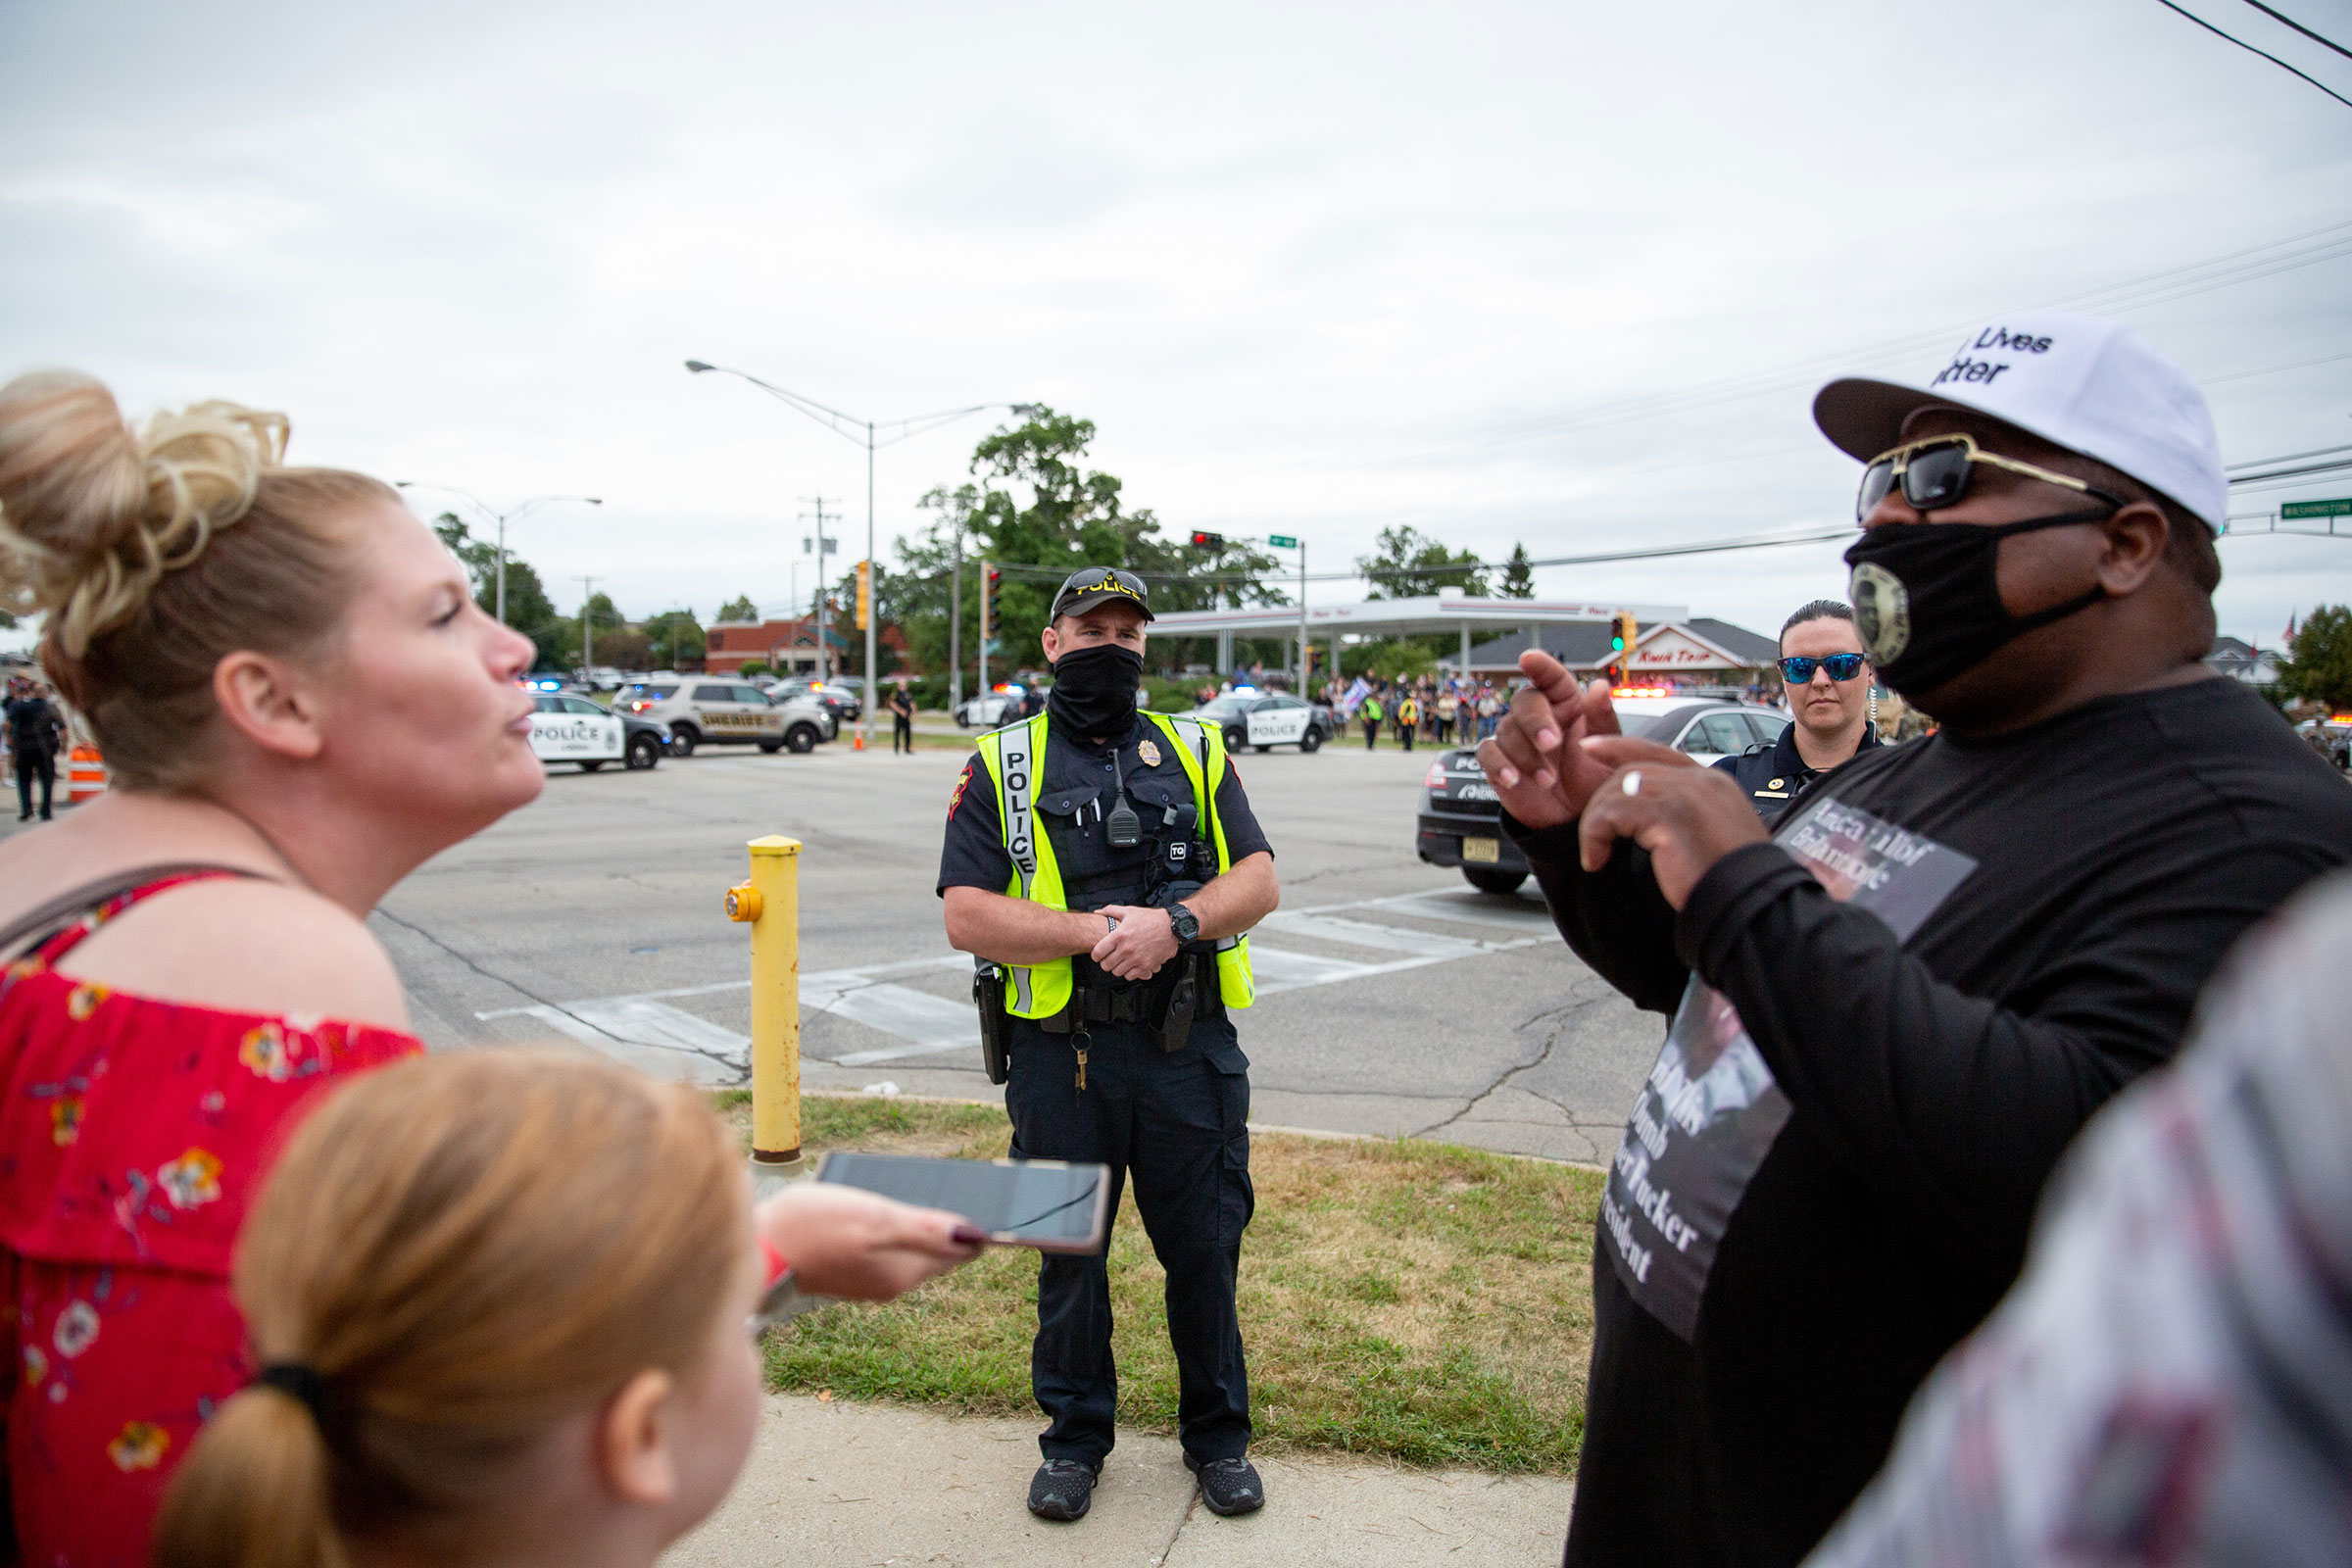 Police watch protestors during President Trump's meeting at Bradford High School in Kenosha, Wis., on Sept. 1, 2020.